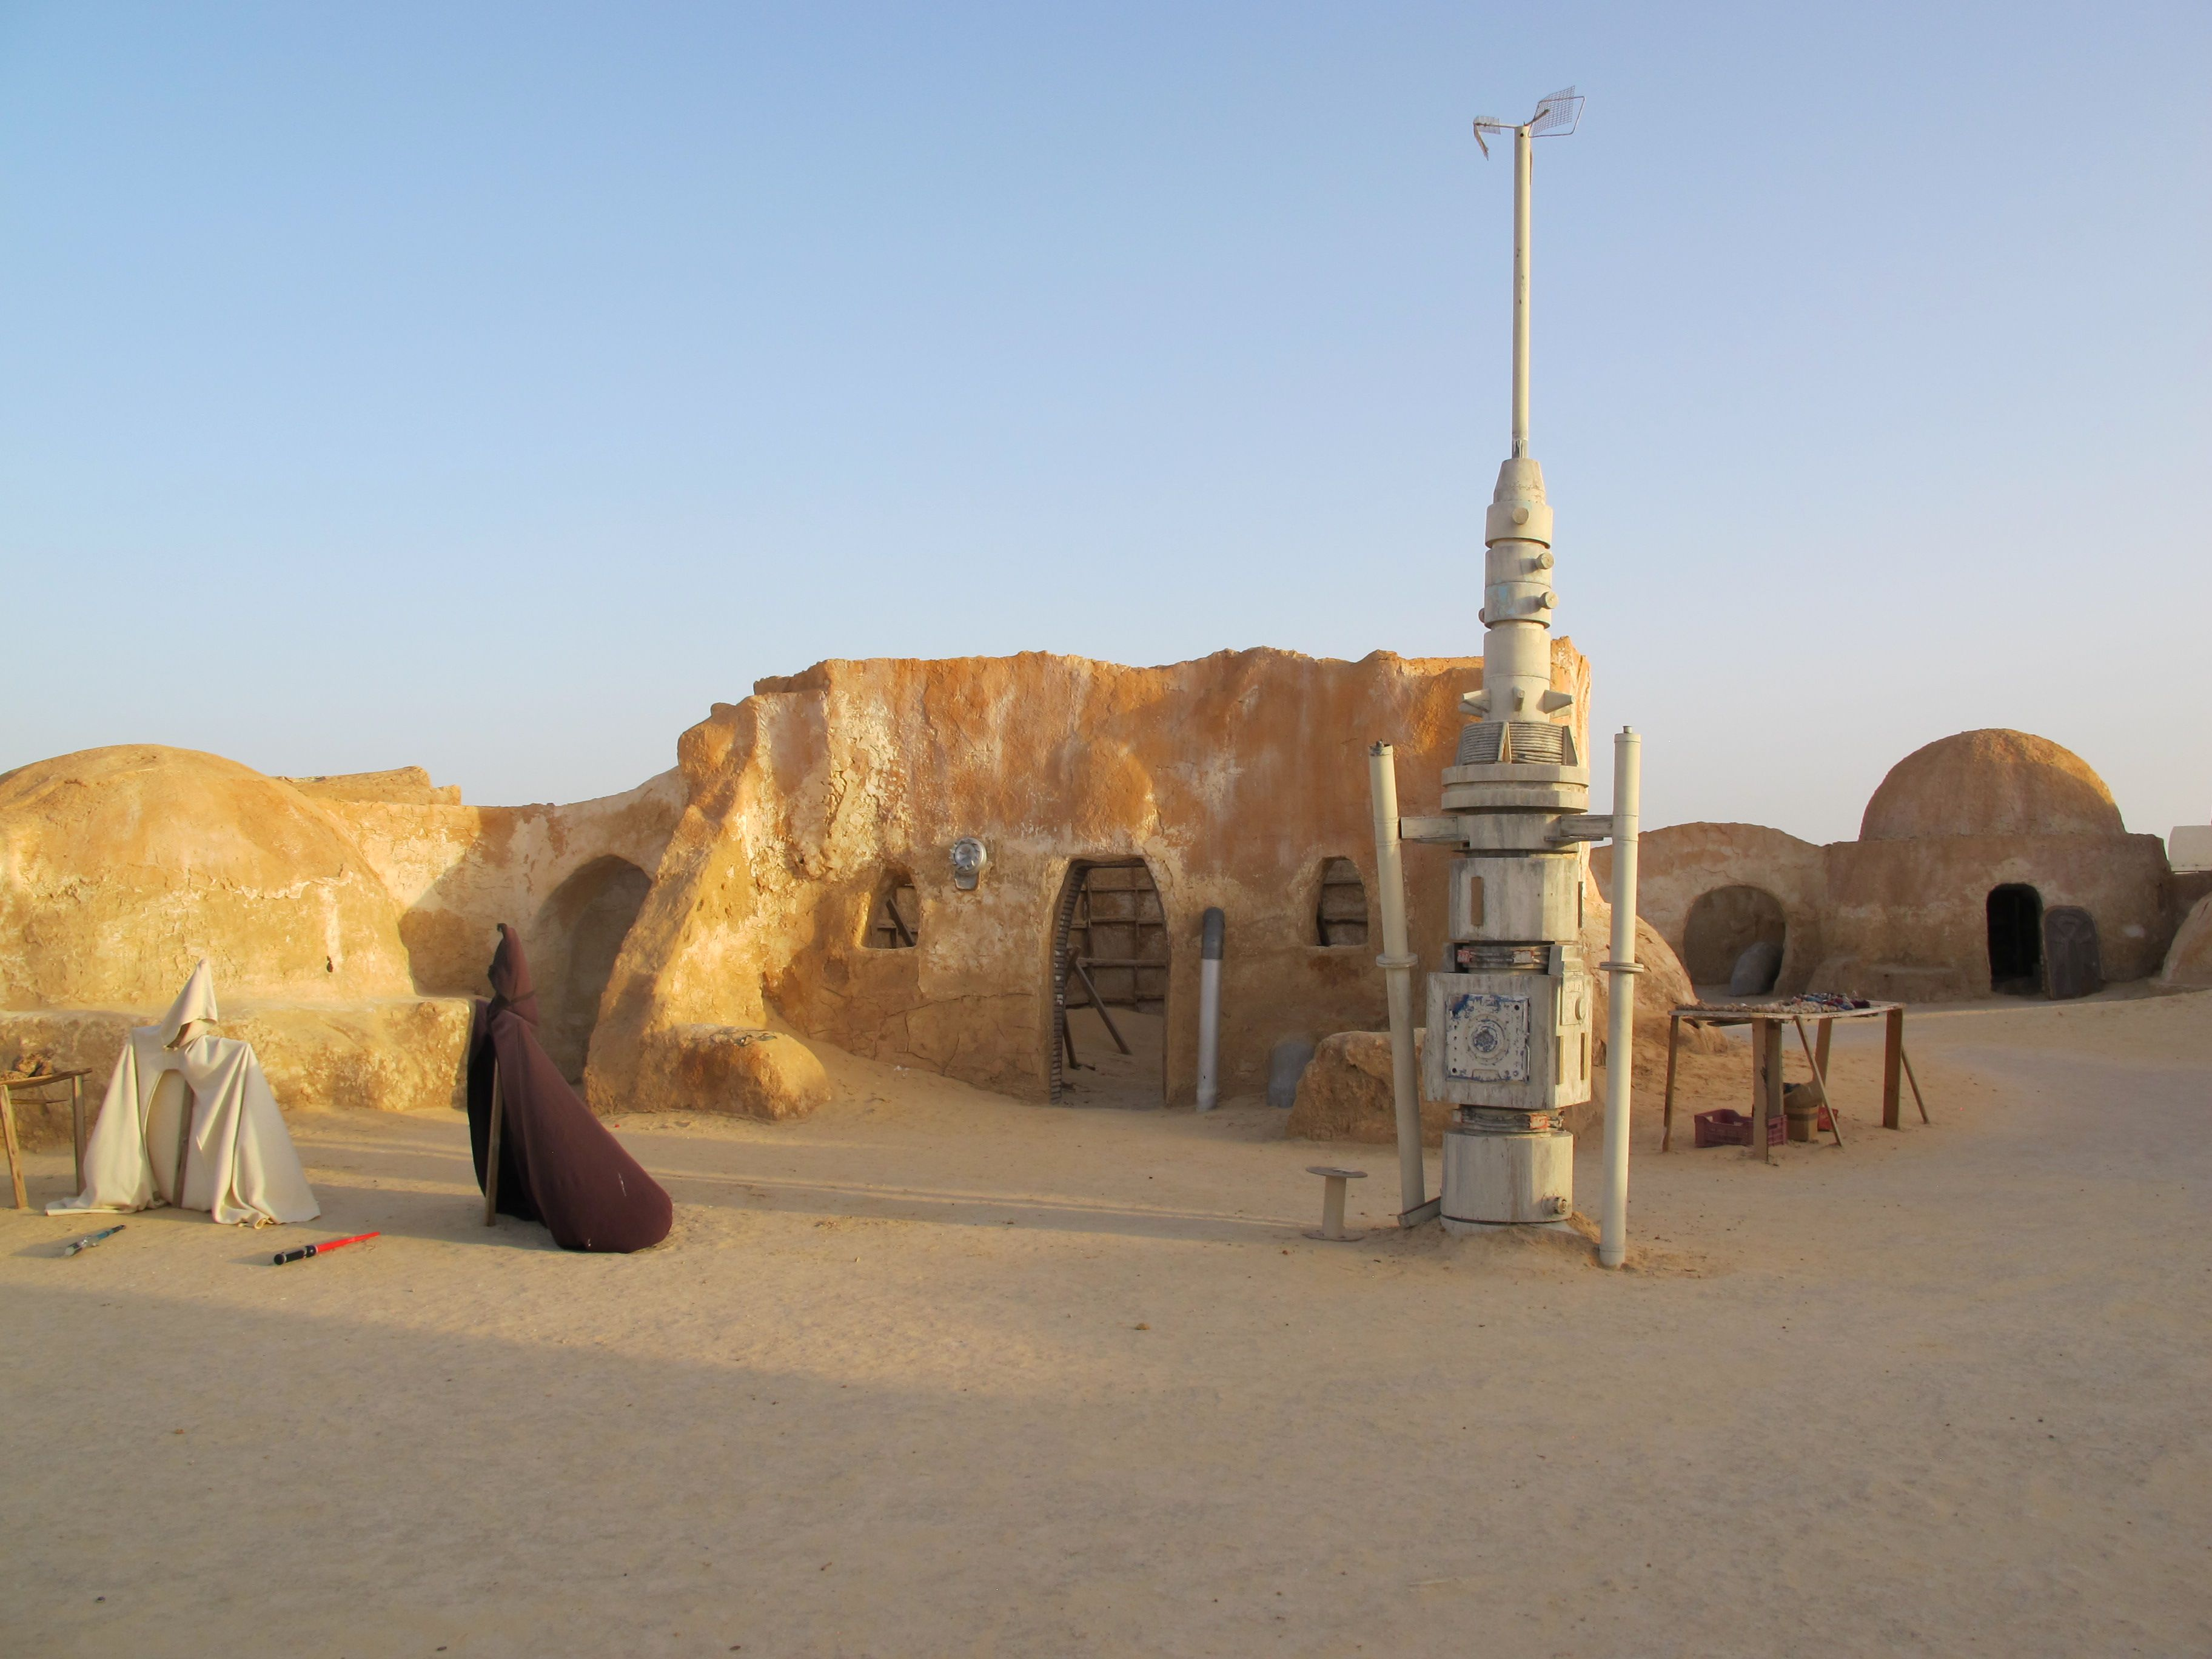 Star Wars Landscape Wallpaper Star Wars Set Star Wars Star Wars Film